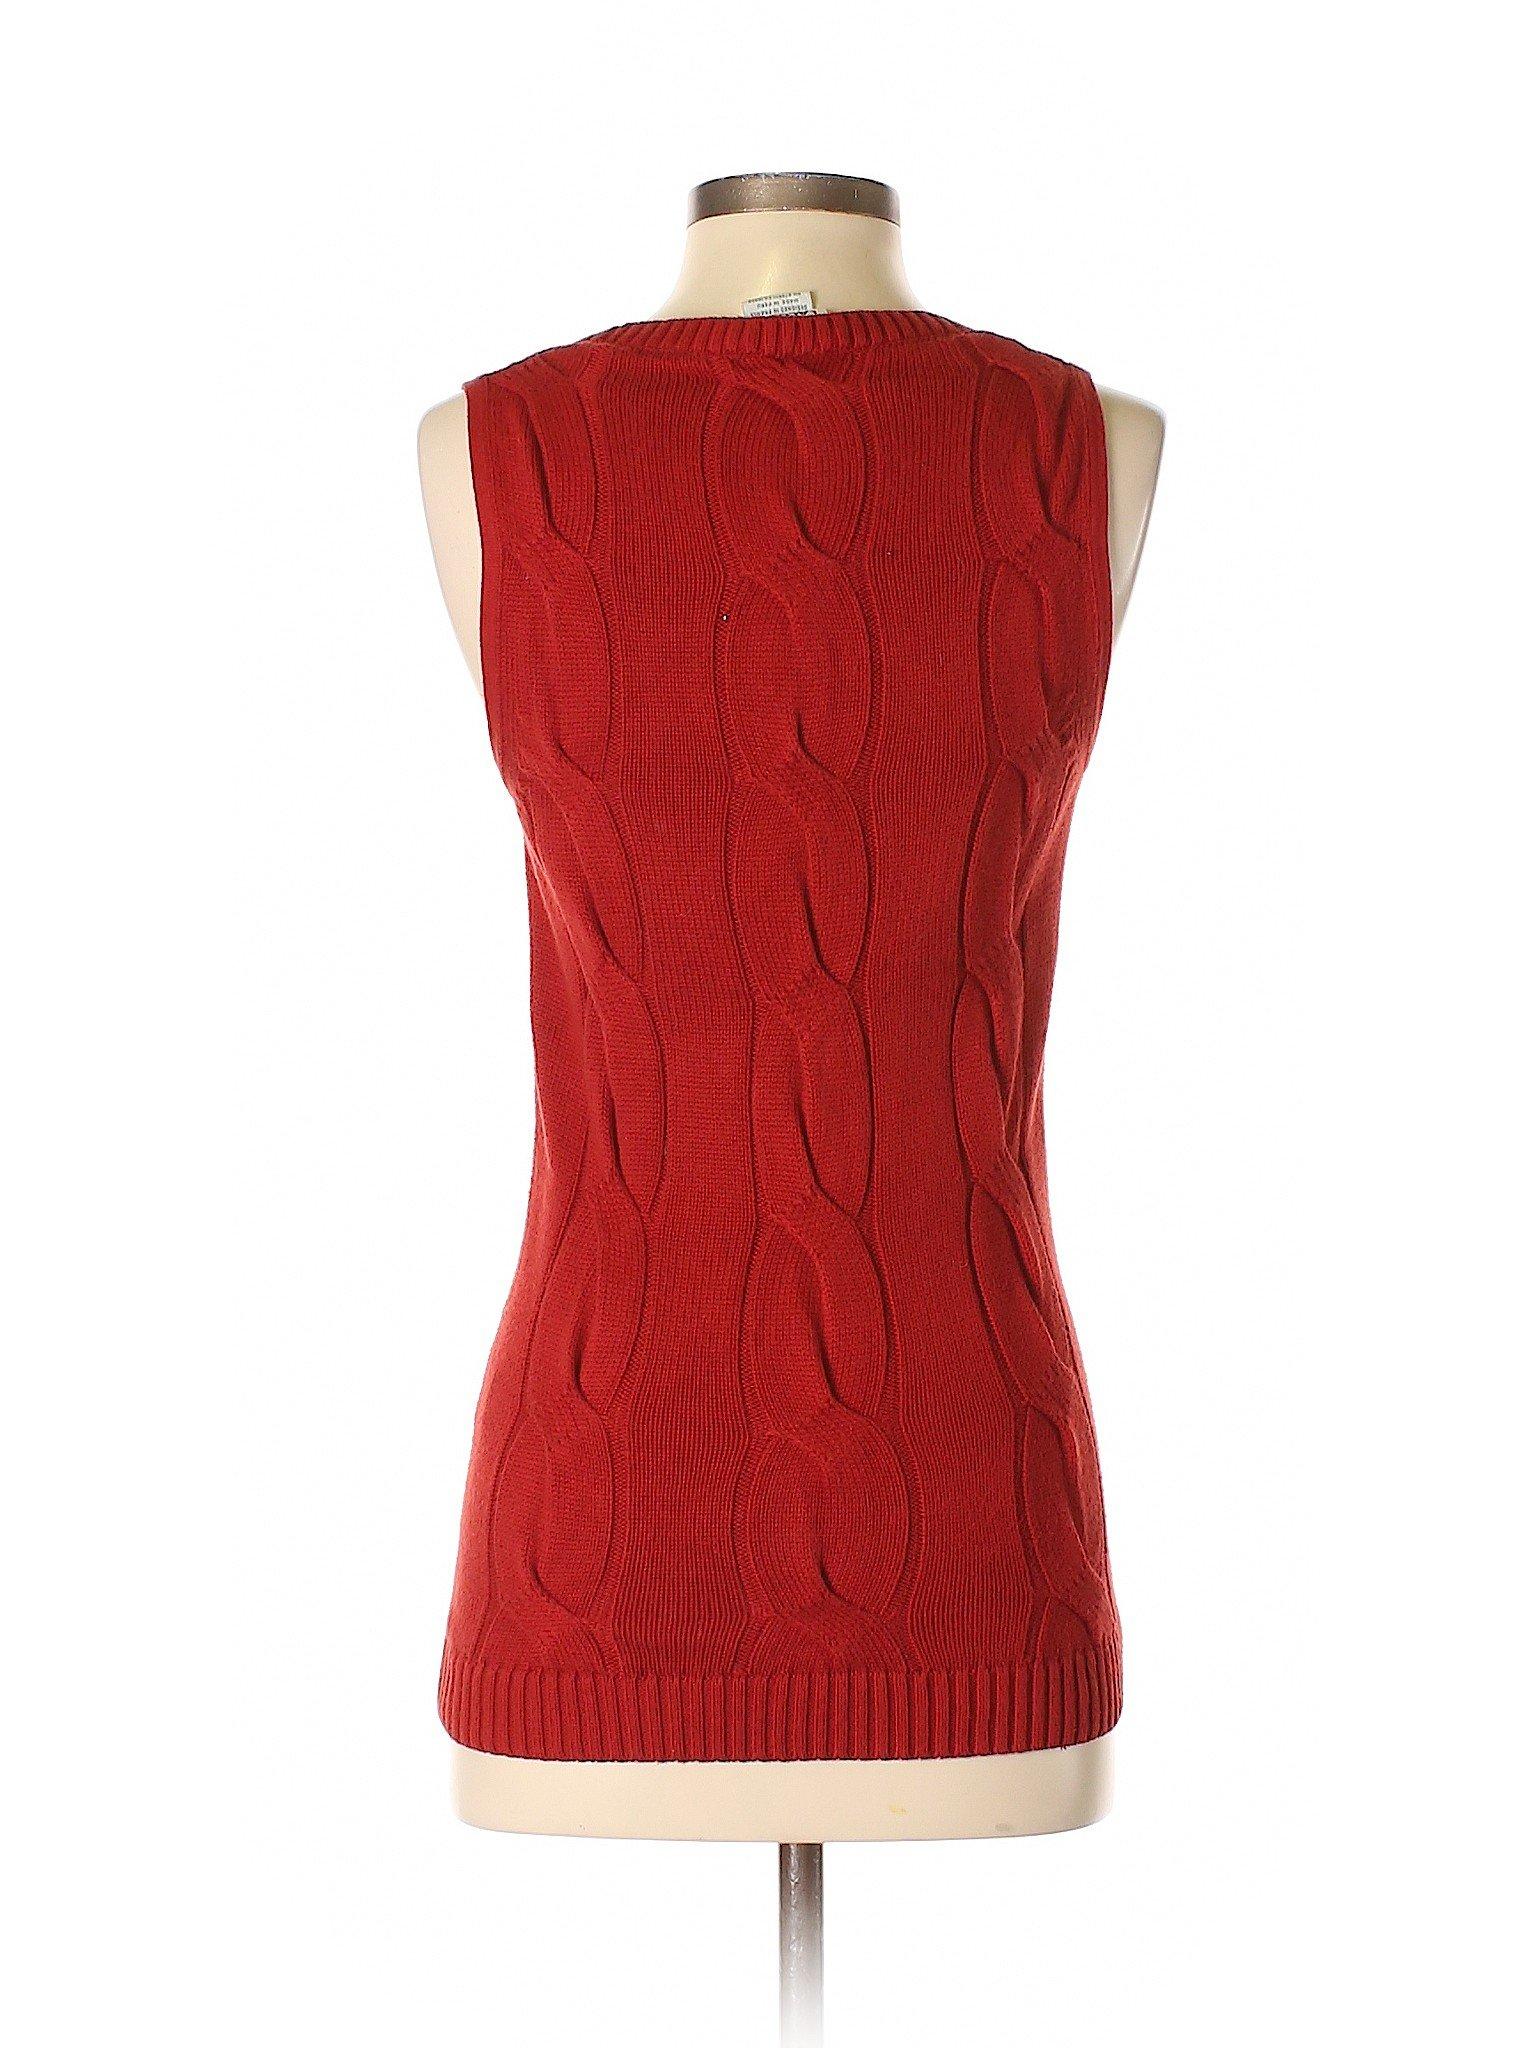 Vest Boutique Boutique Winter Sweater Sweater Winter Sweater Lacoste Lacoste Boutique Vest Lacoste Winter w4q7HFxB